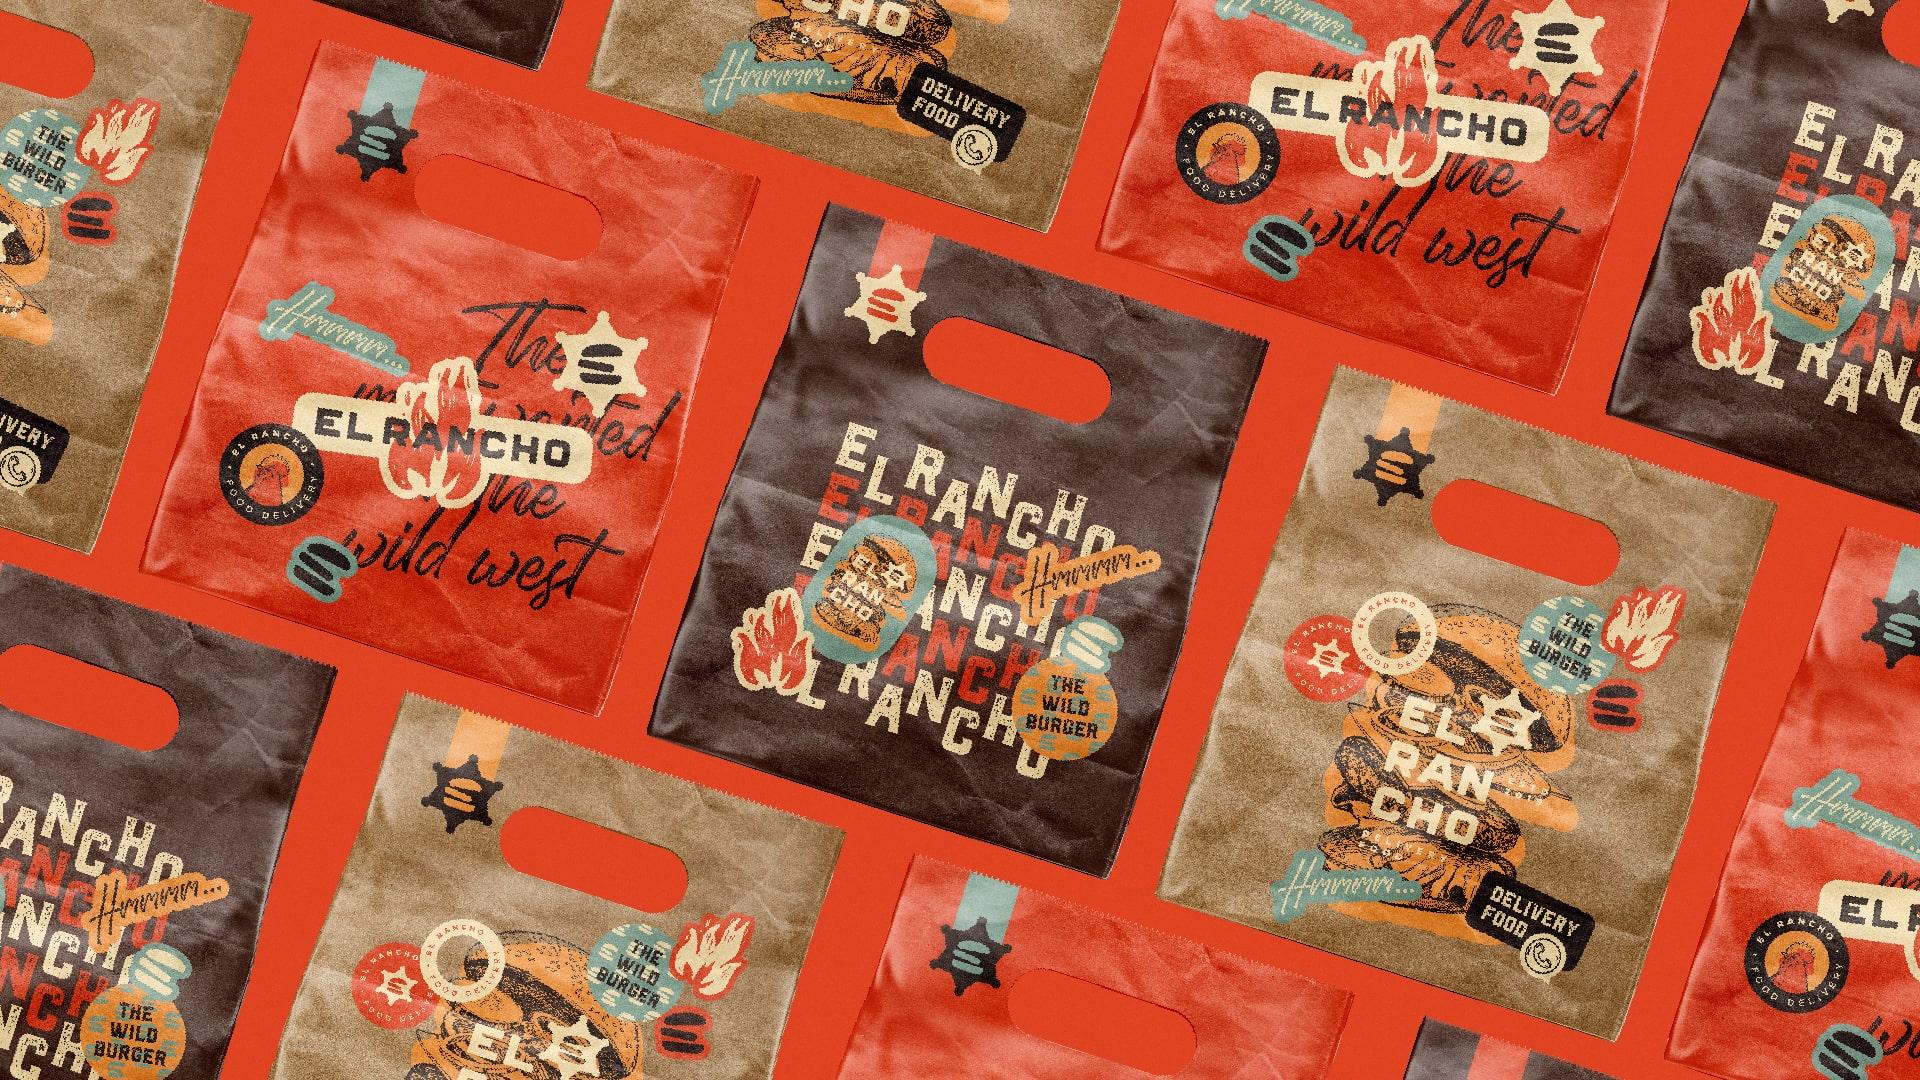 El Rancho Brand and Visual Identity by Matheus Ferreira